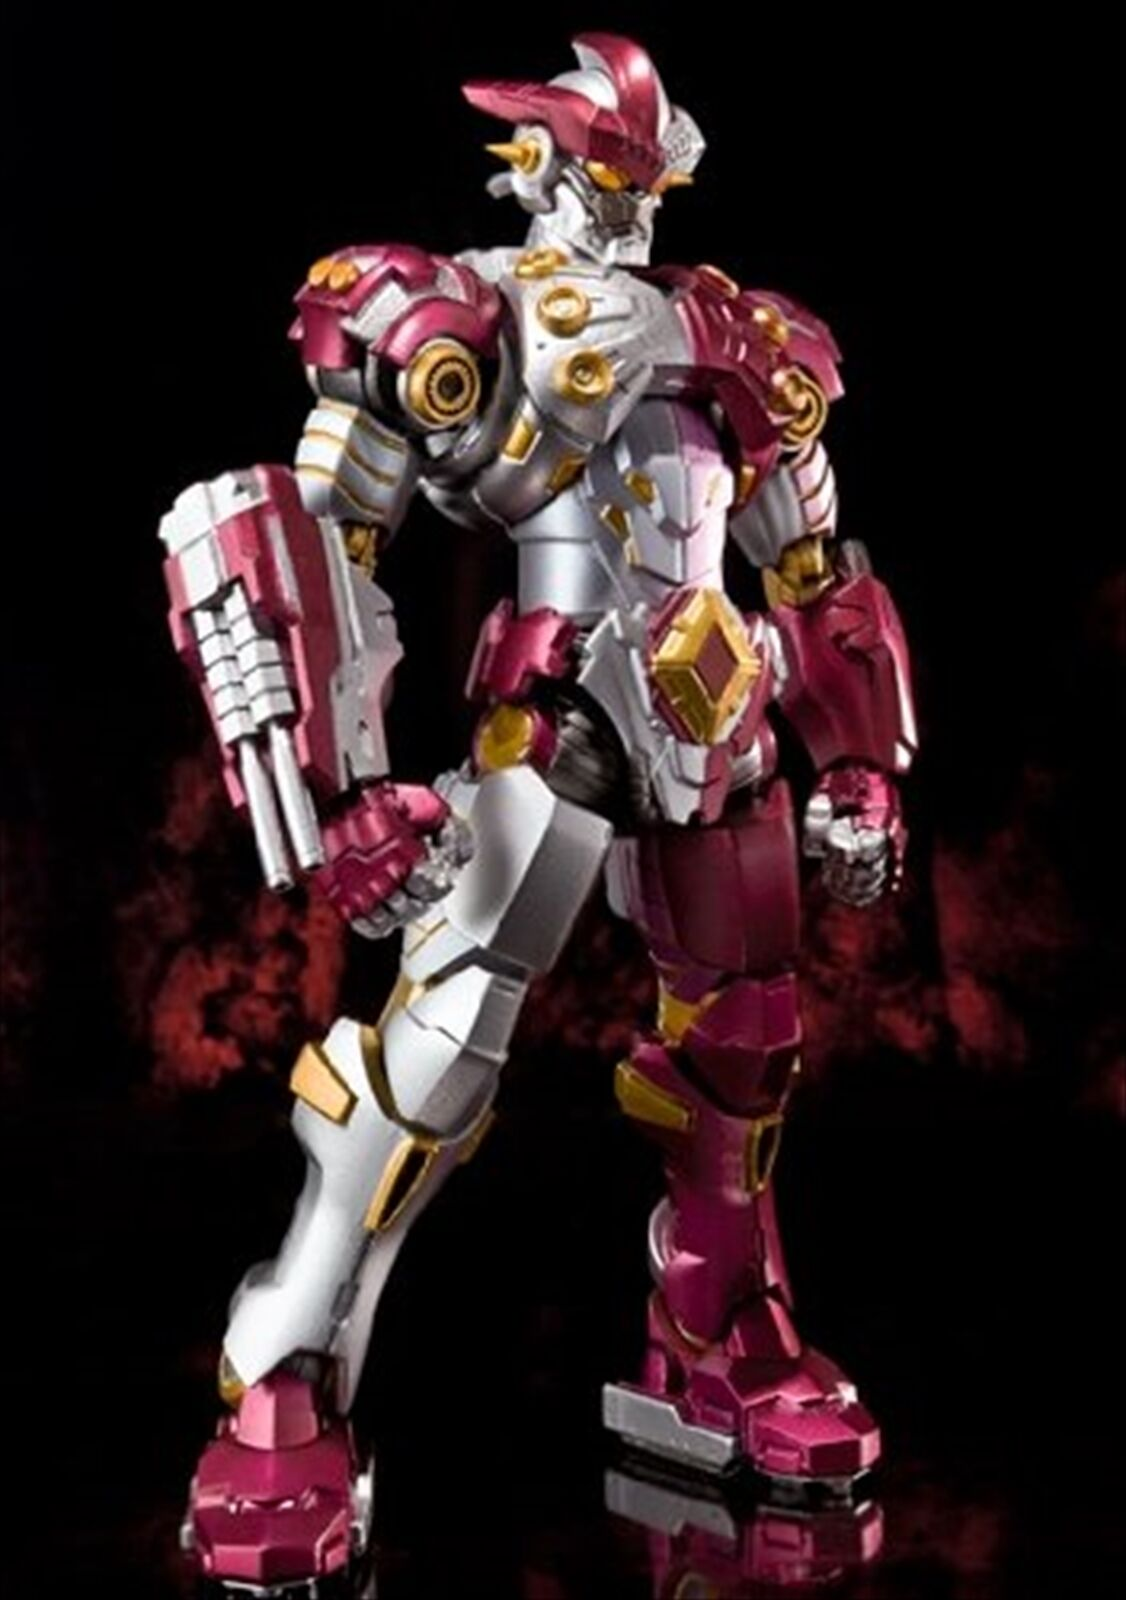 Bandai ULTRA-ACT Ultraman Zero Gaiden Killer the Beat Star Jean Killer Figure